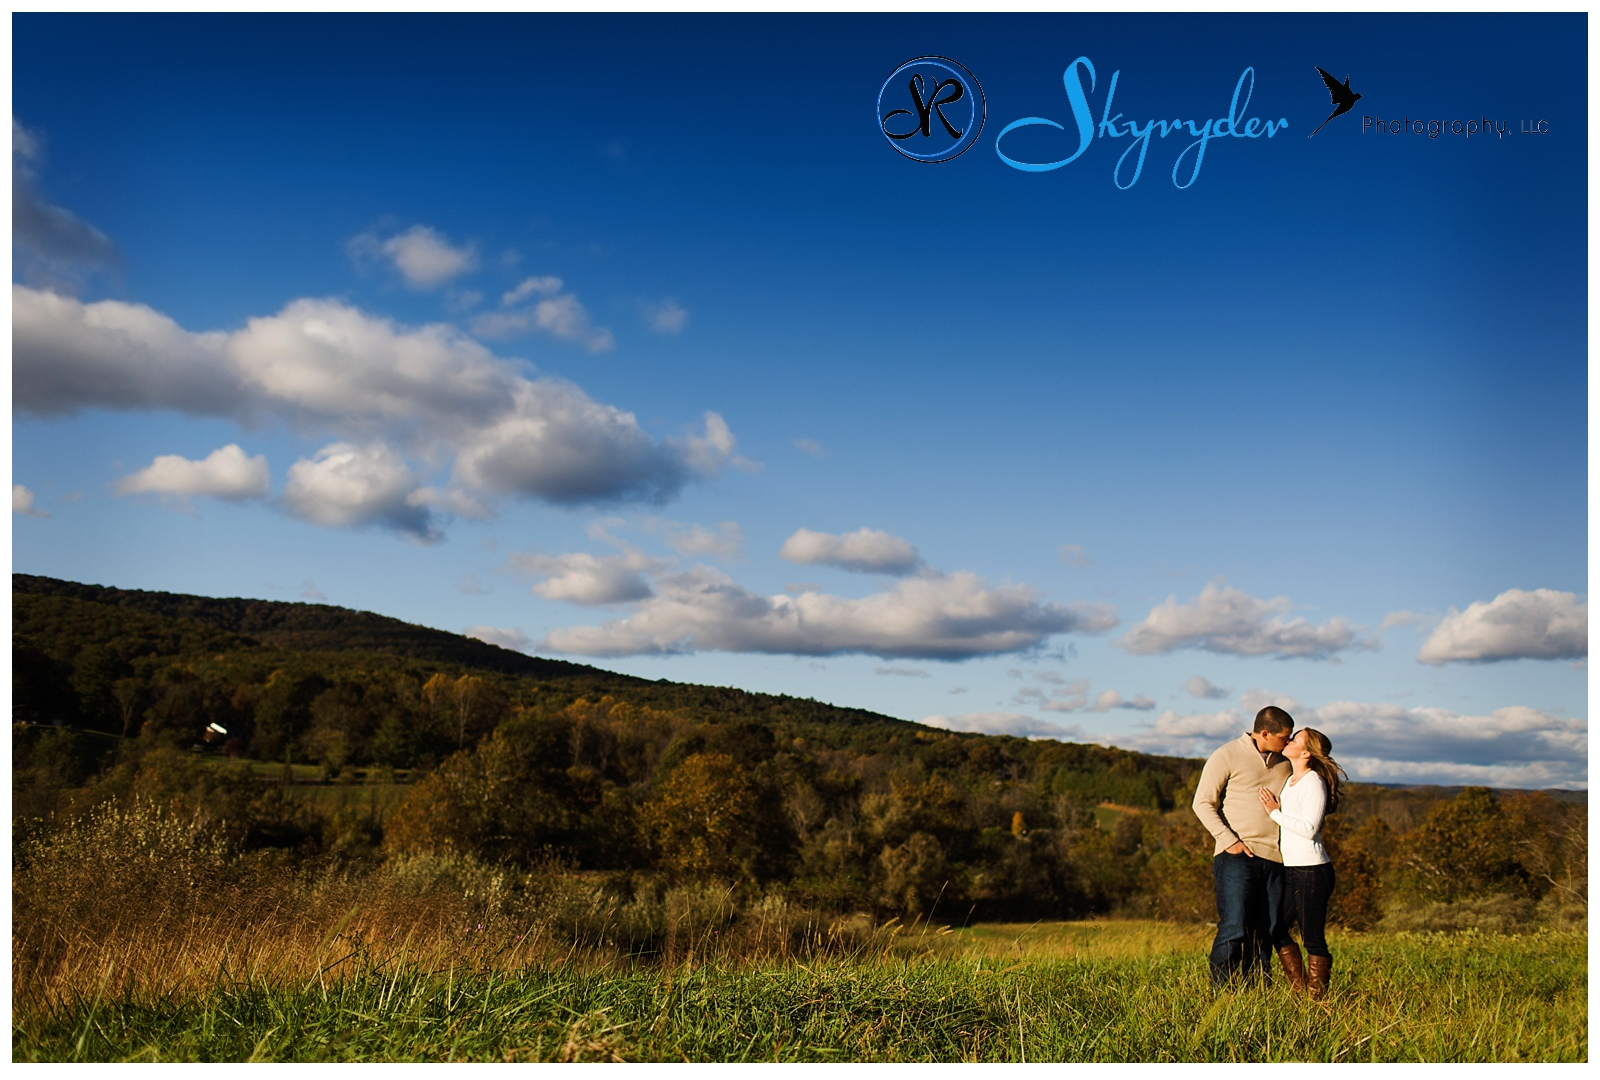 skyryder photography engagement photographer blacksburg vt virginia tech roanoke charlottesville radford lexington